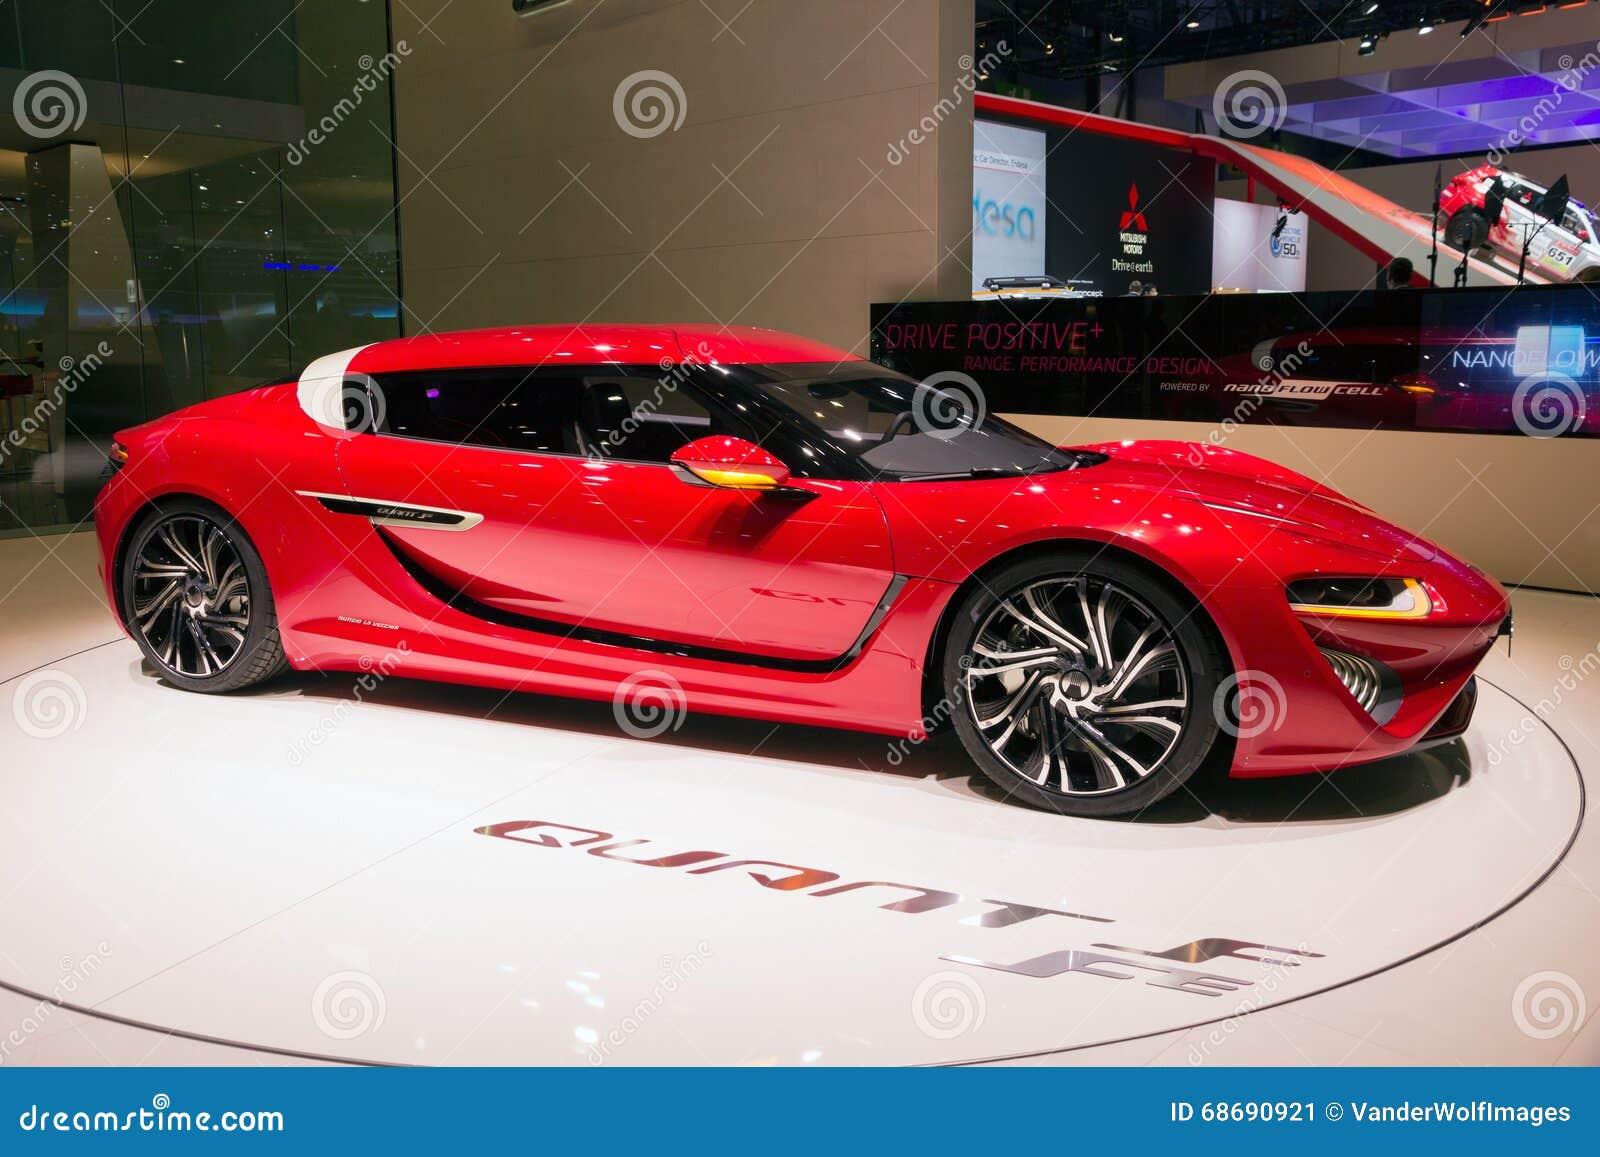 2016 nanoflowcell quant fe car editorial photo image 68690921. Black Bedroom Furniture Sets. Home Design Ideas